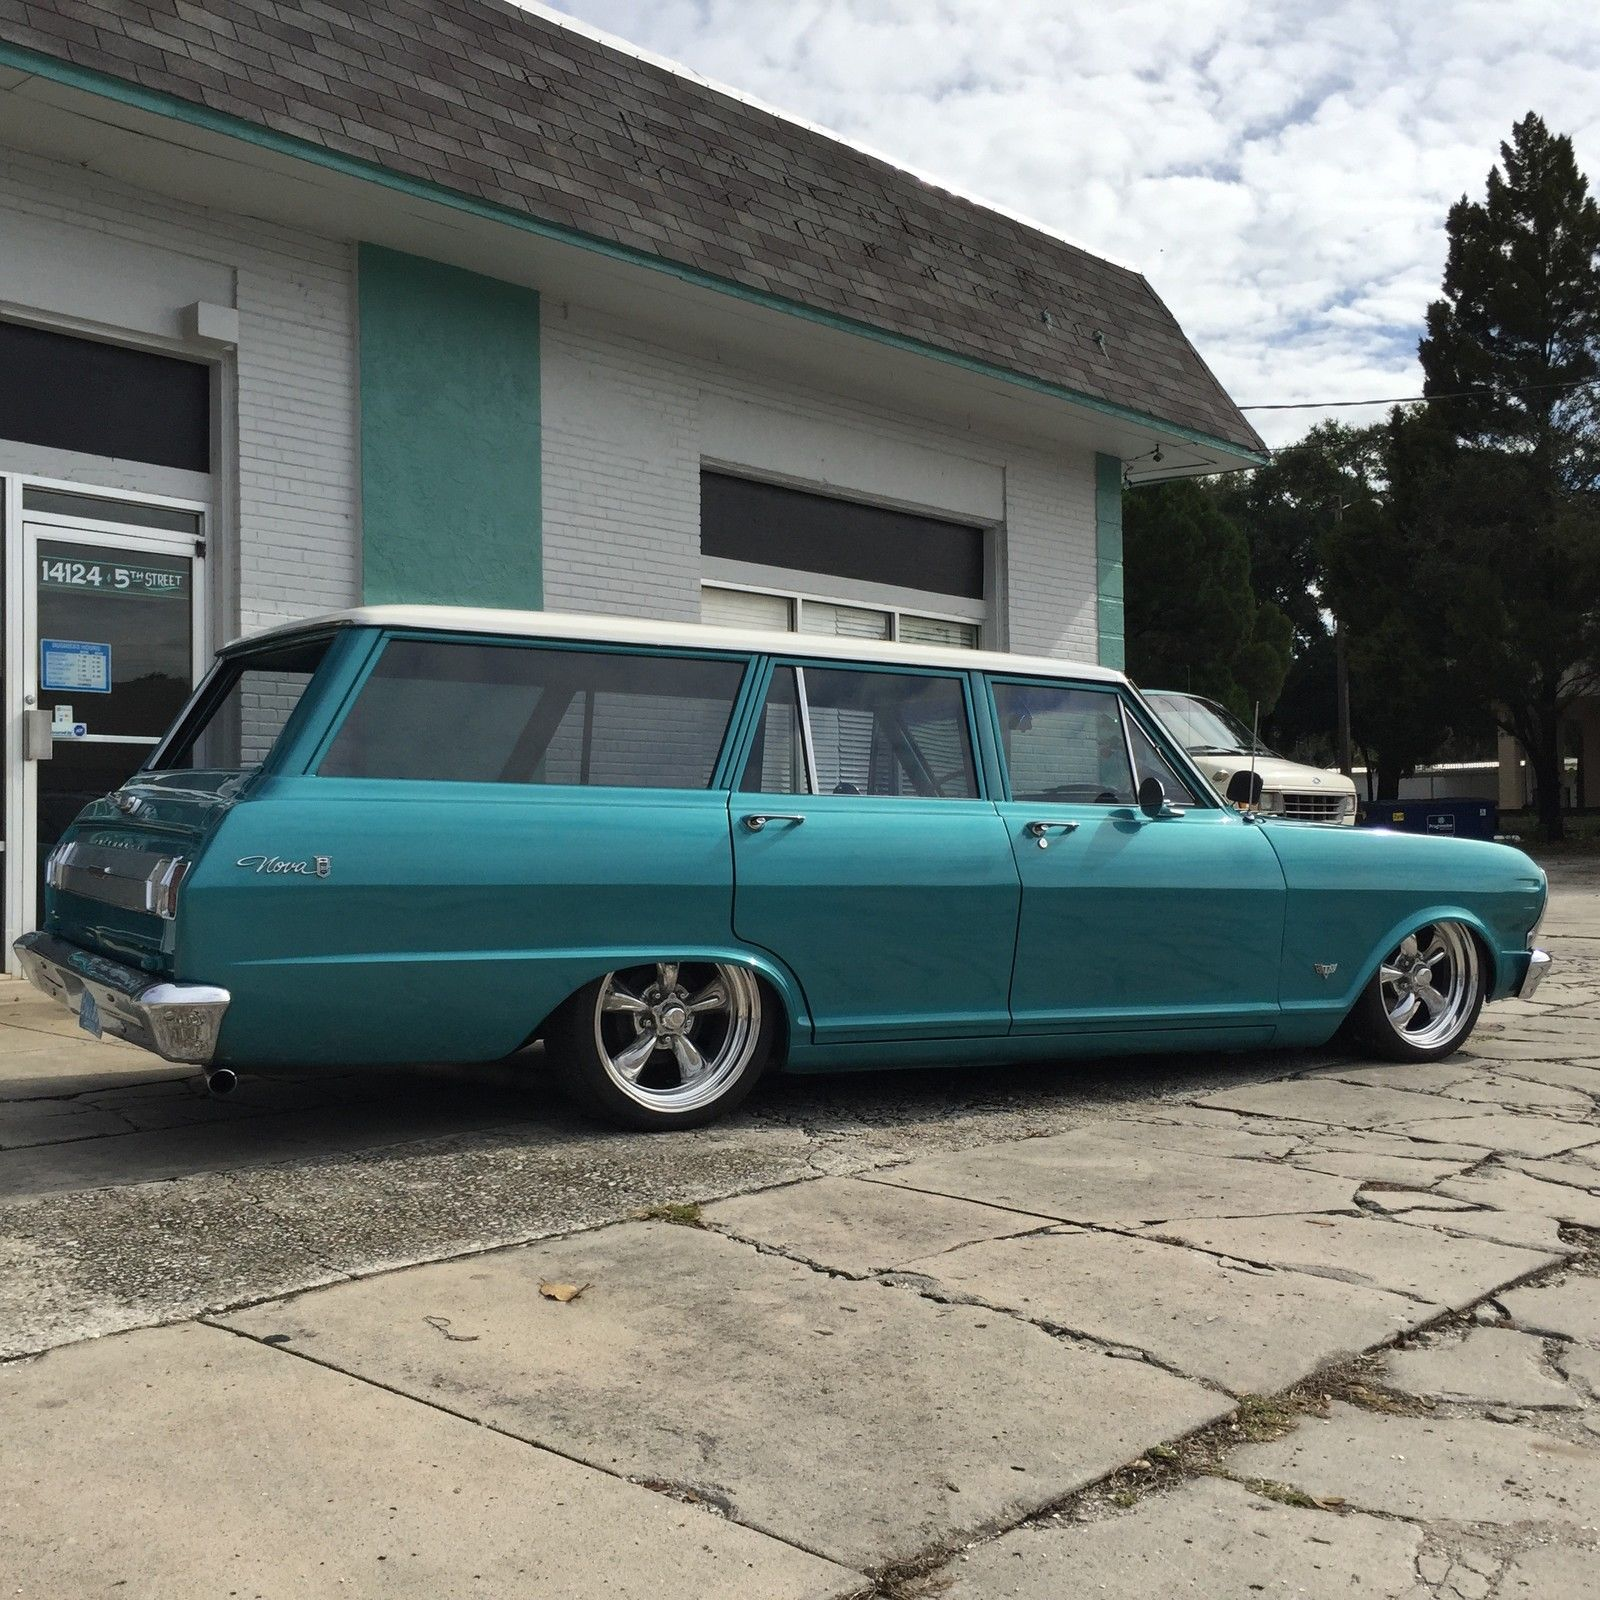 1965 Chevrolet Nova Station Wagon Air Ride Chevy II Hot